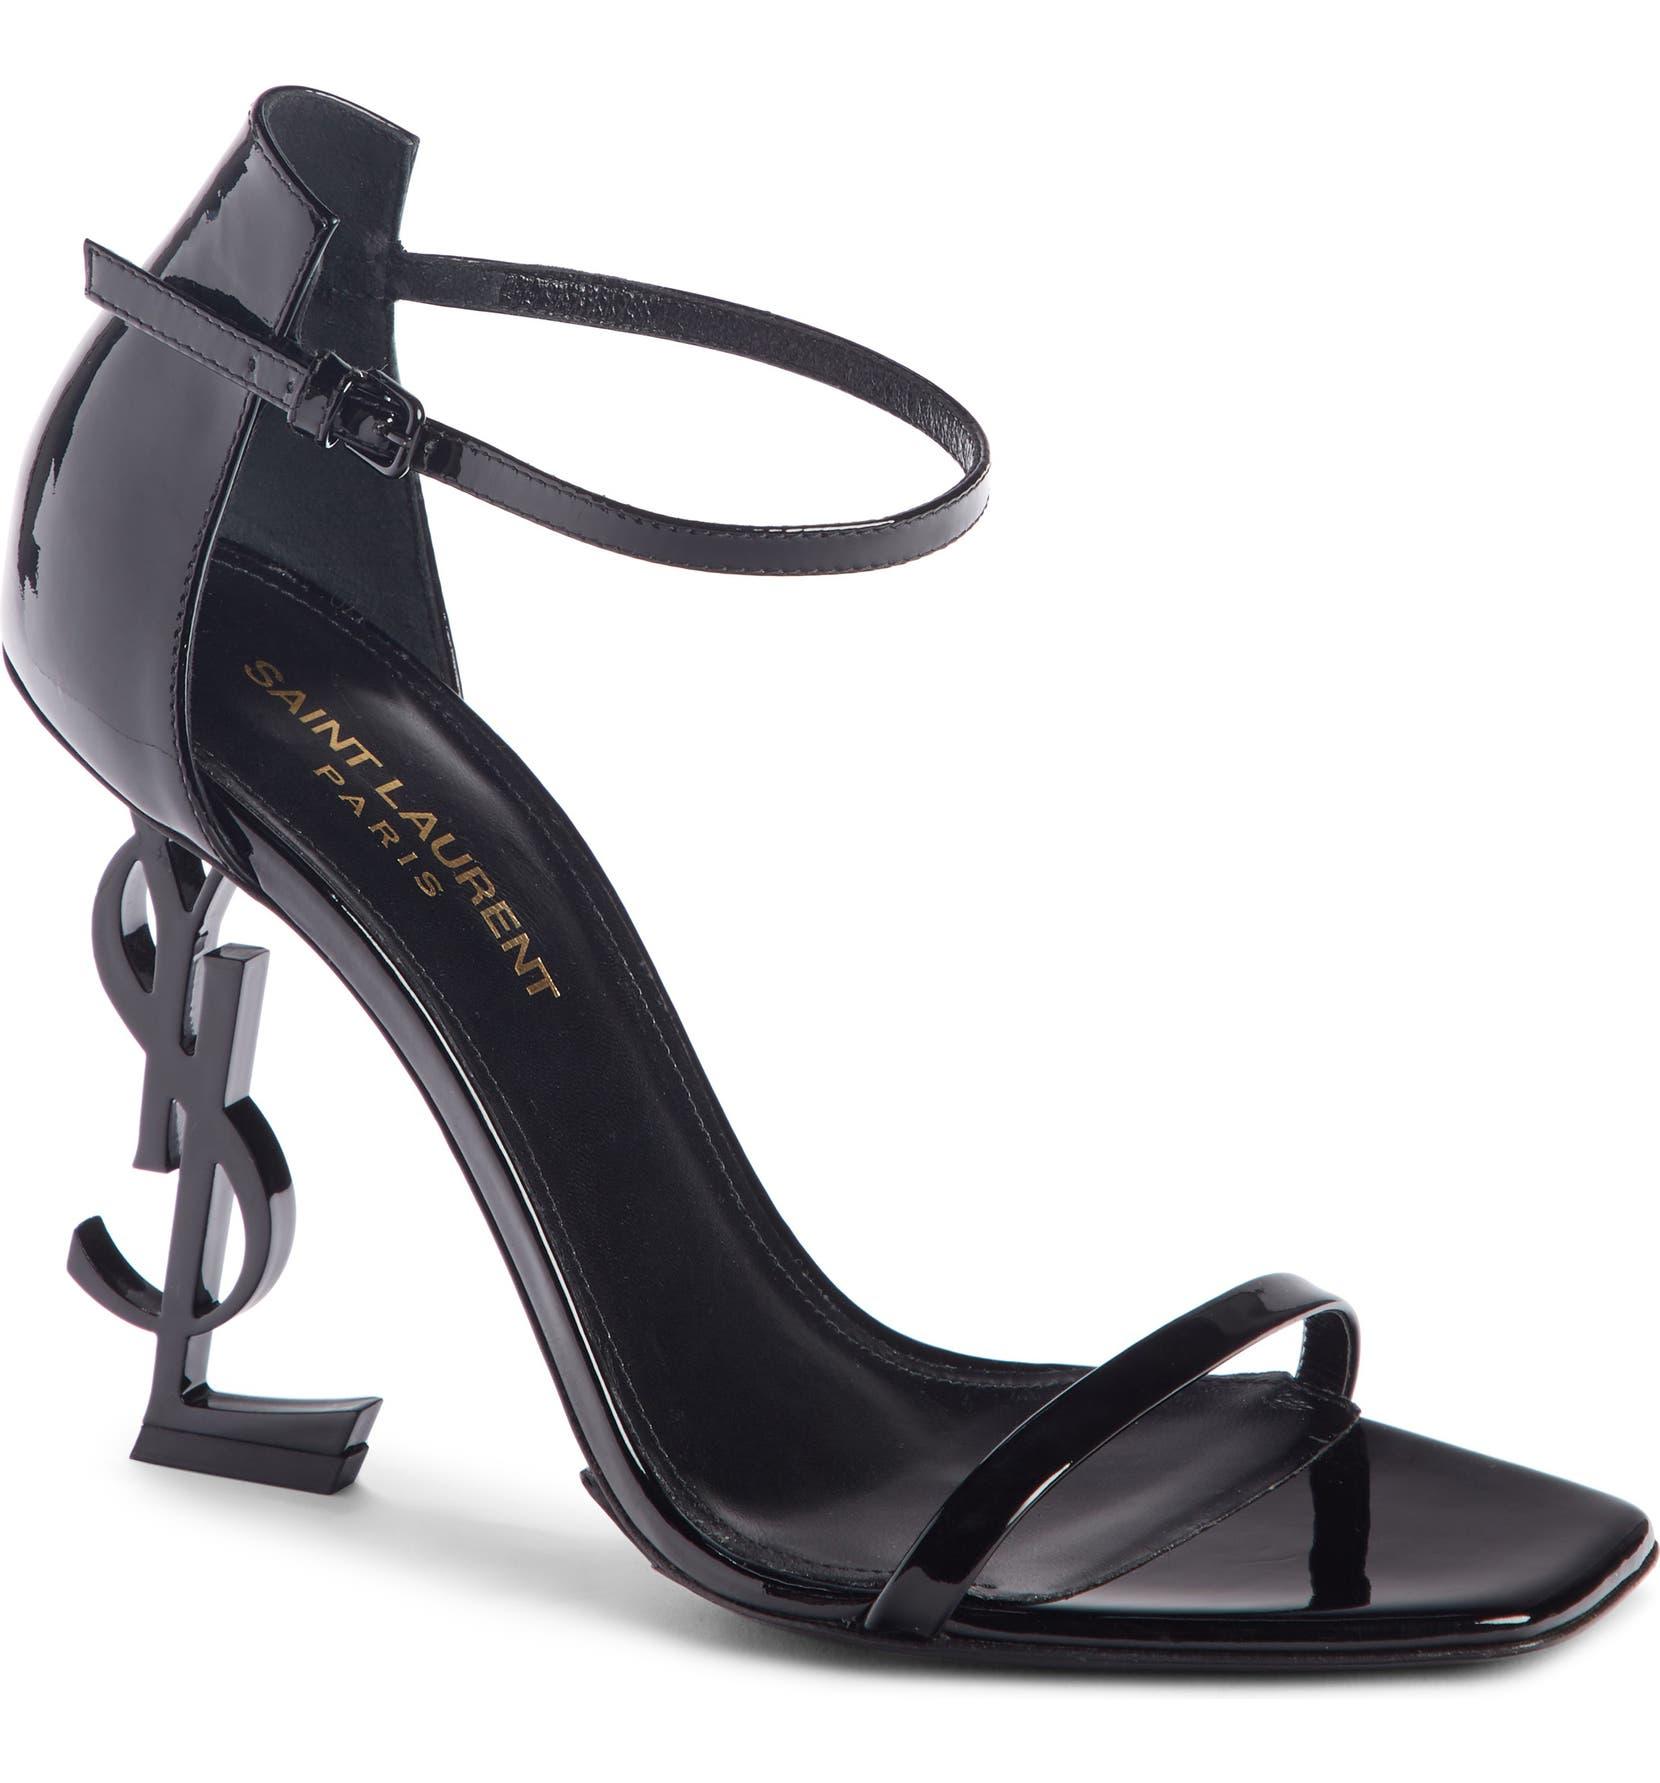 19fb467ab68 Saint Laurent Opyum YSL Ankle Strap Sandal (Women) | Nordstrom